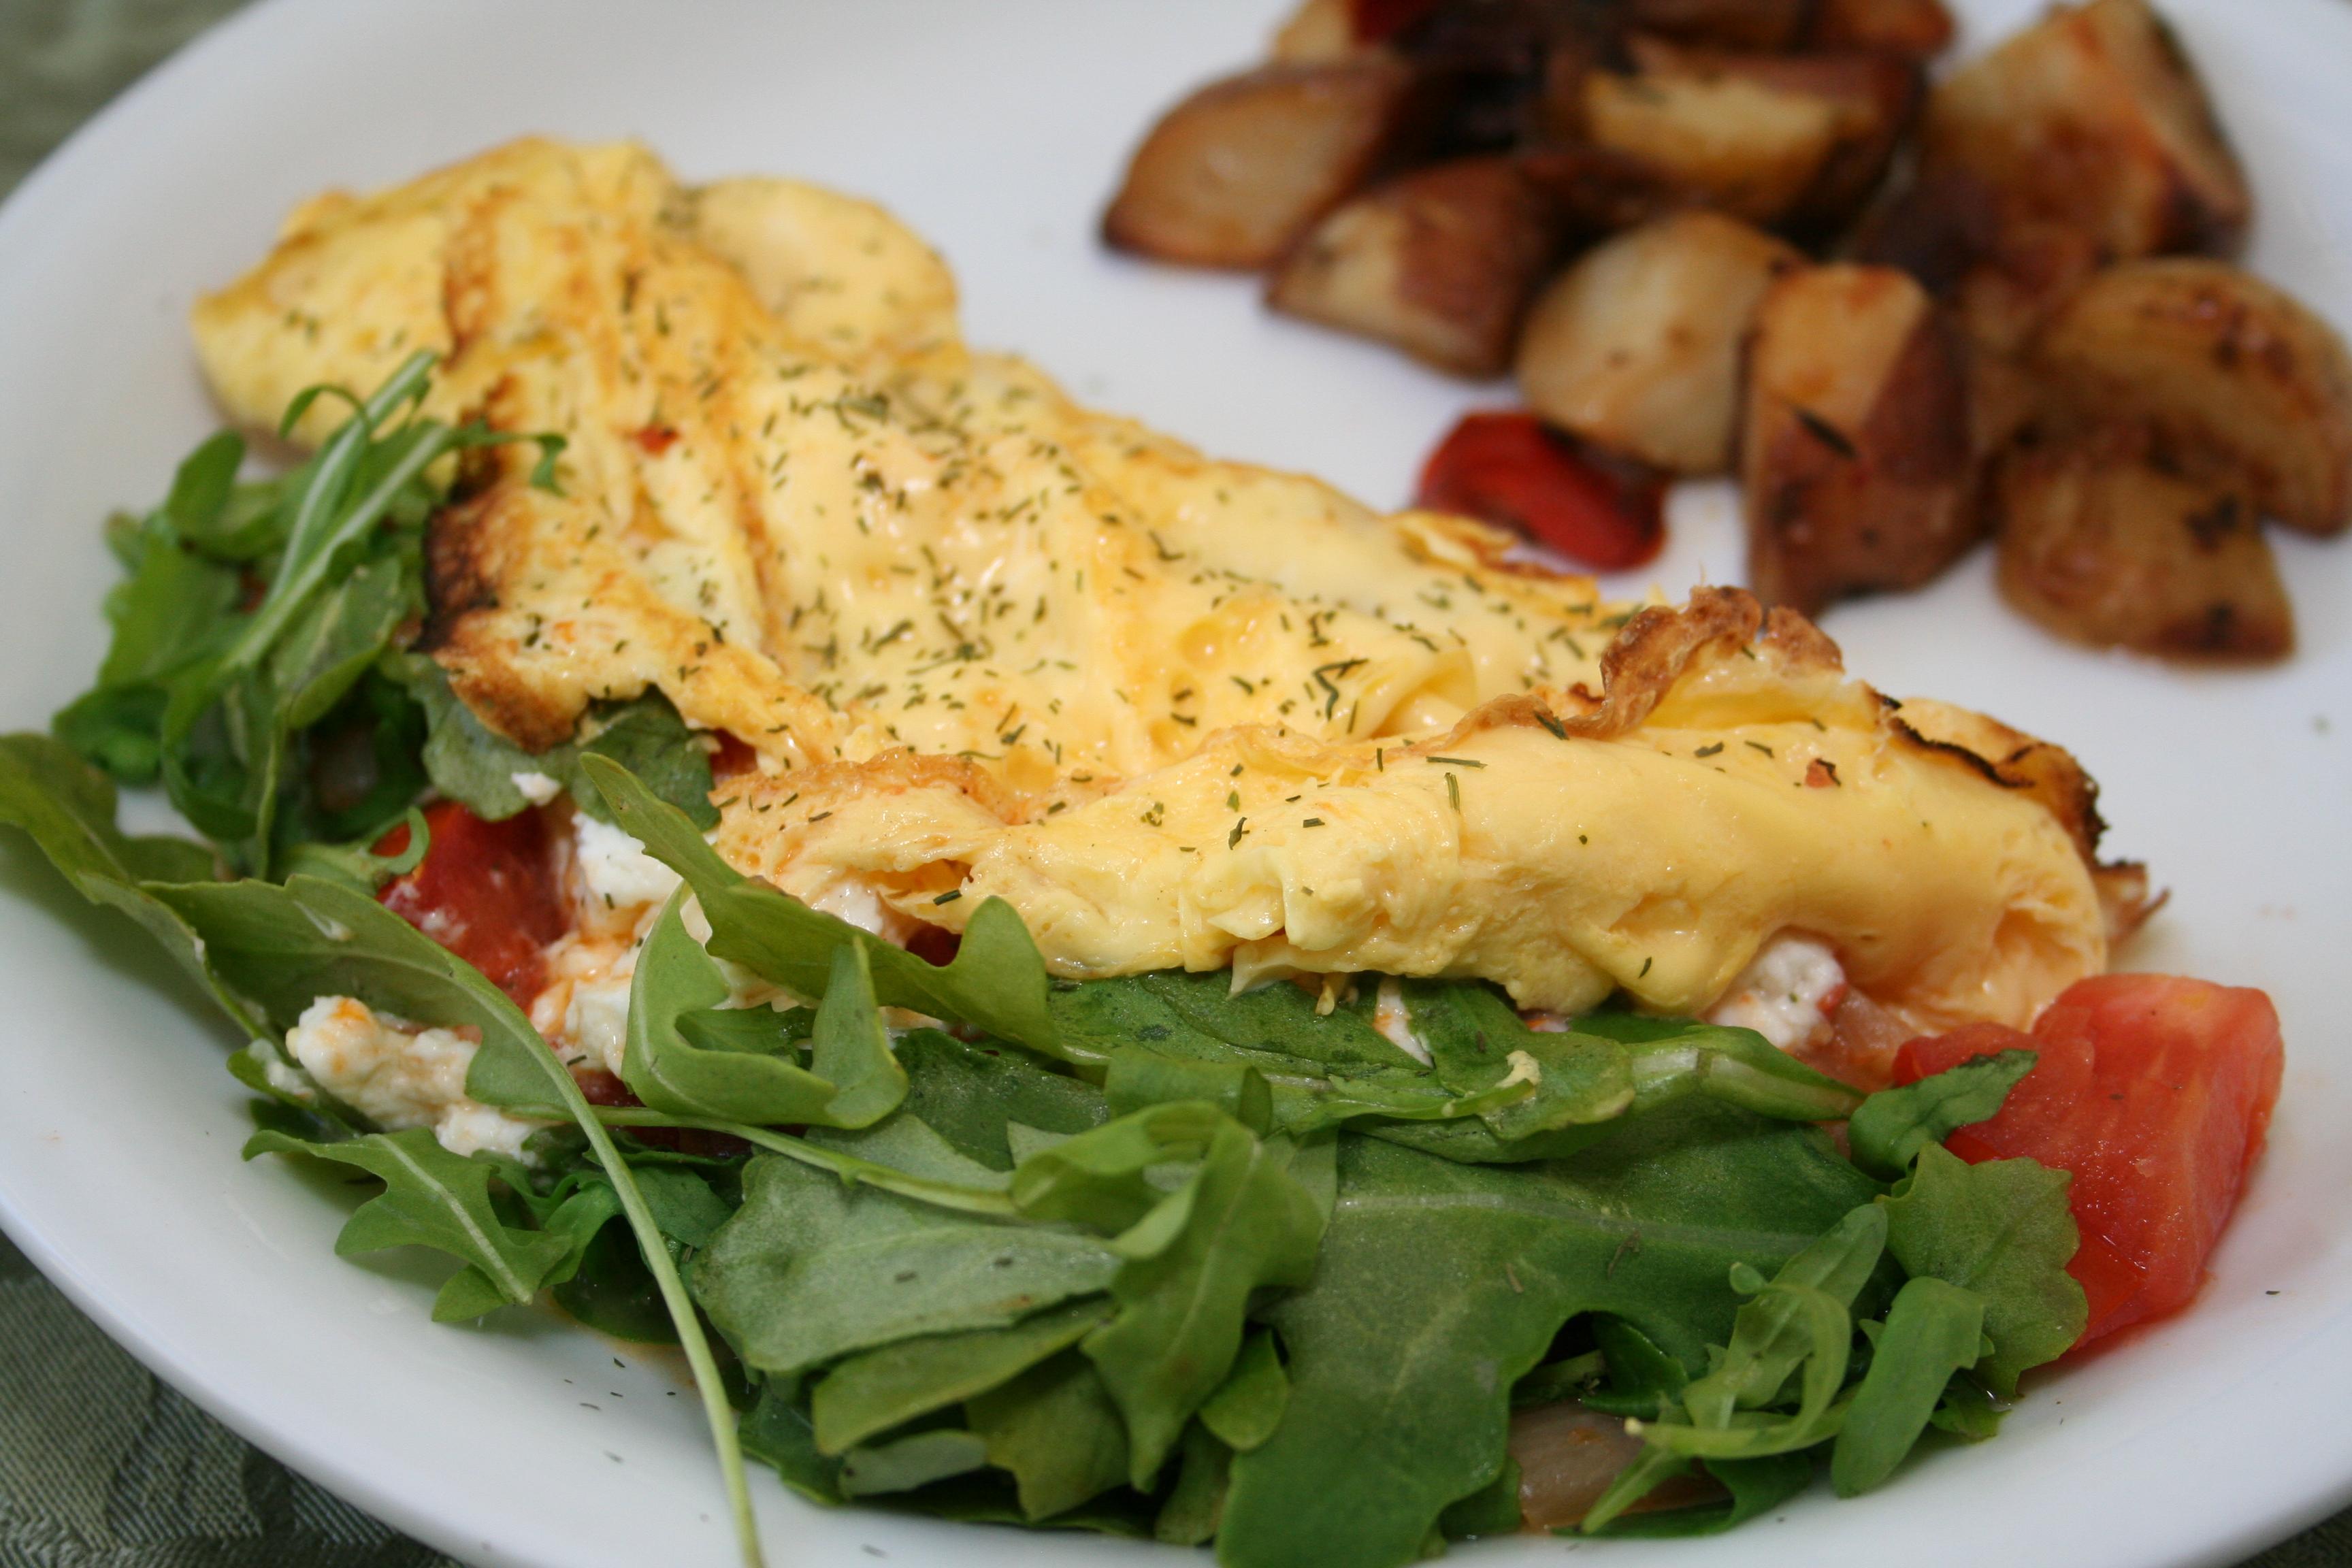 feta and chive omelette möhren ebly mit champignon omelette dazu ...